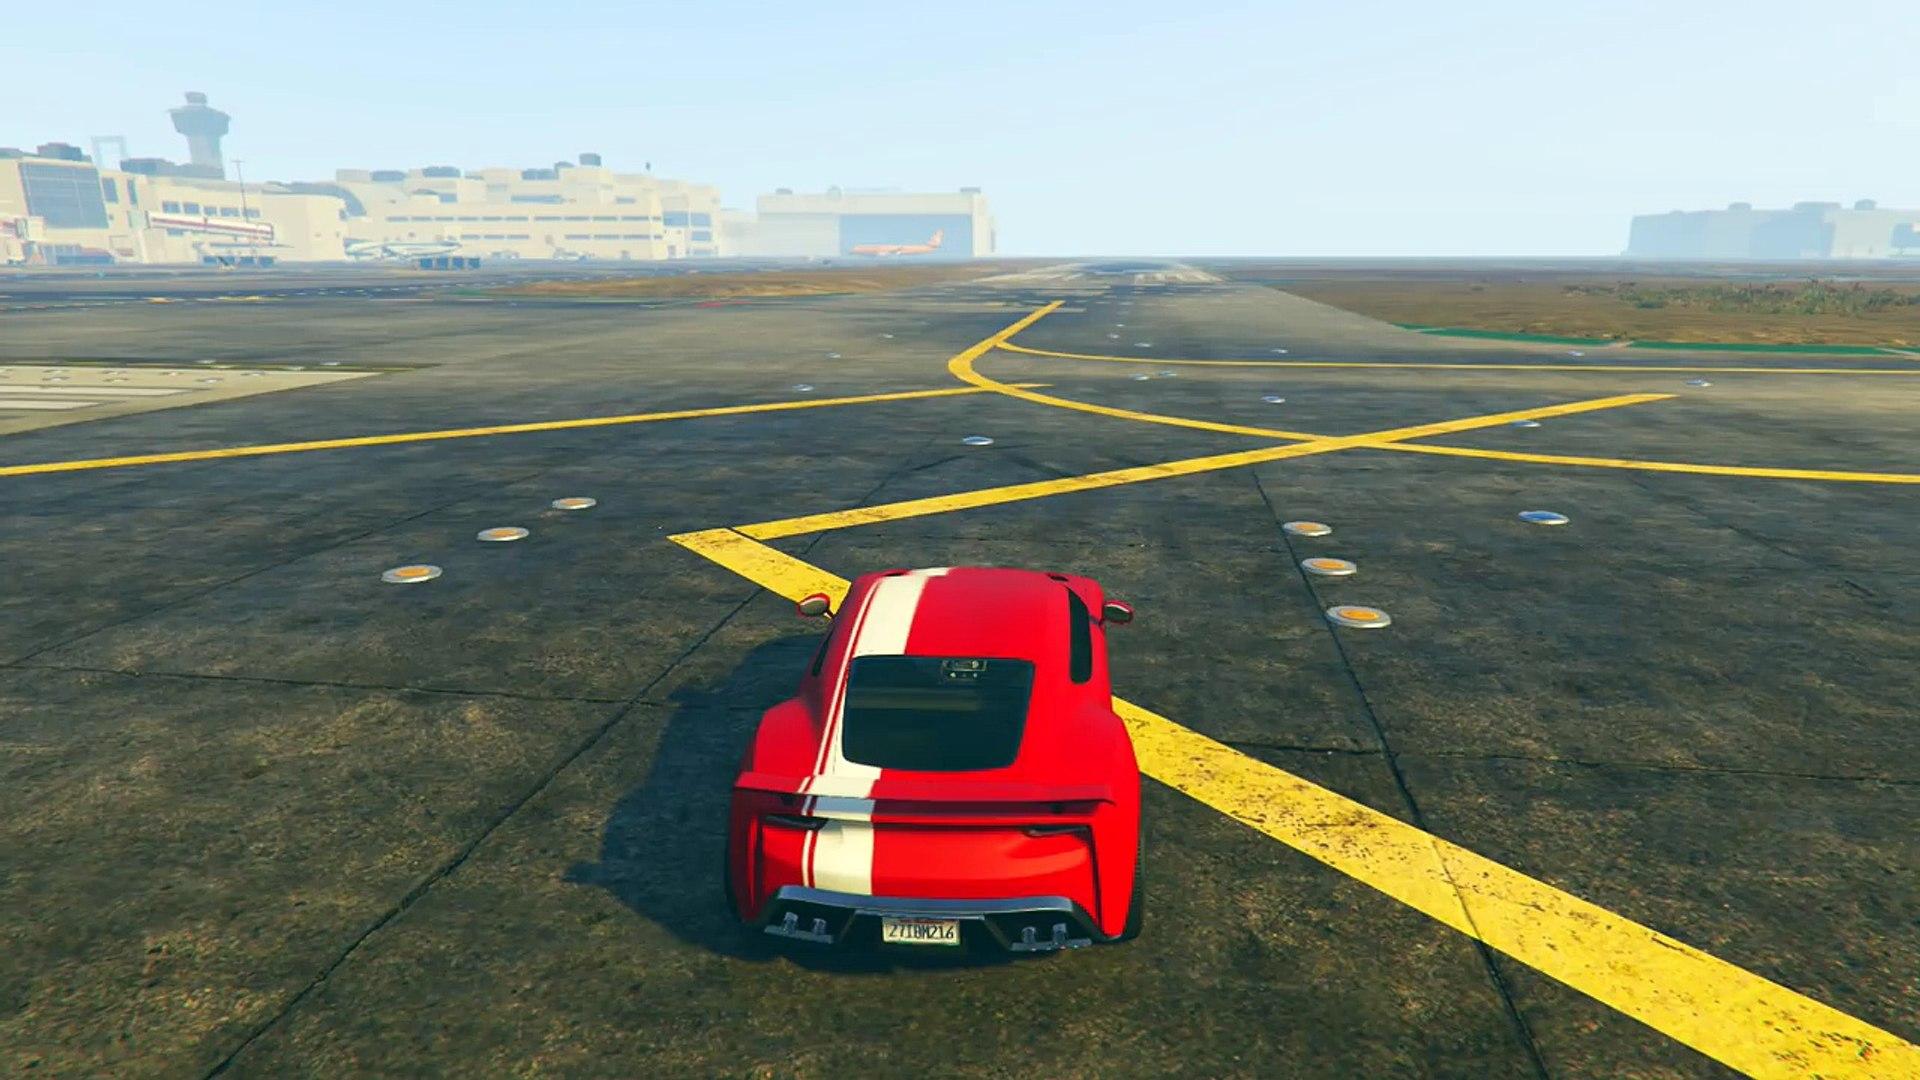 Gta 5 Online Ufficiale L Auto Piu Veloce Di Gta Online Gta 5 Ita Speed Test Video Dailymotion